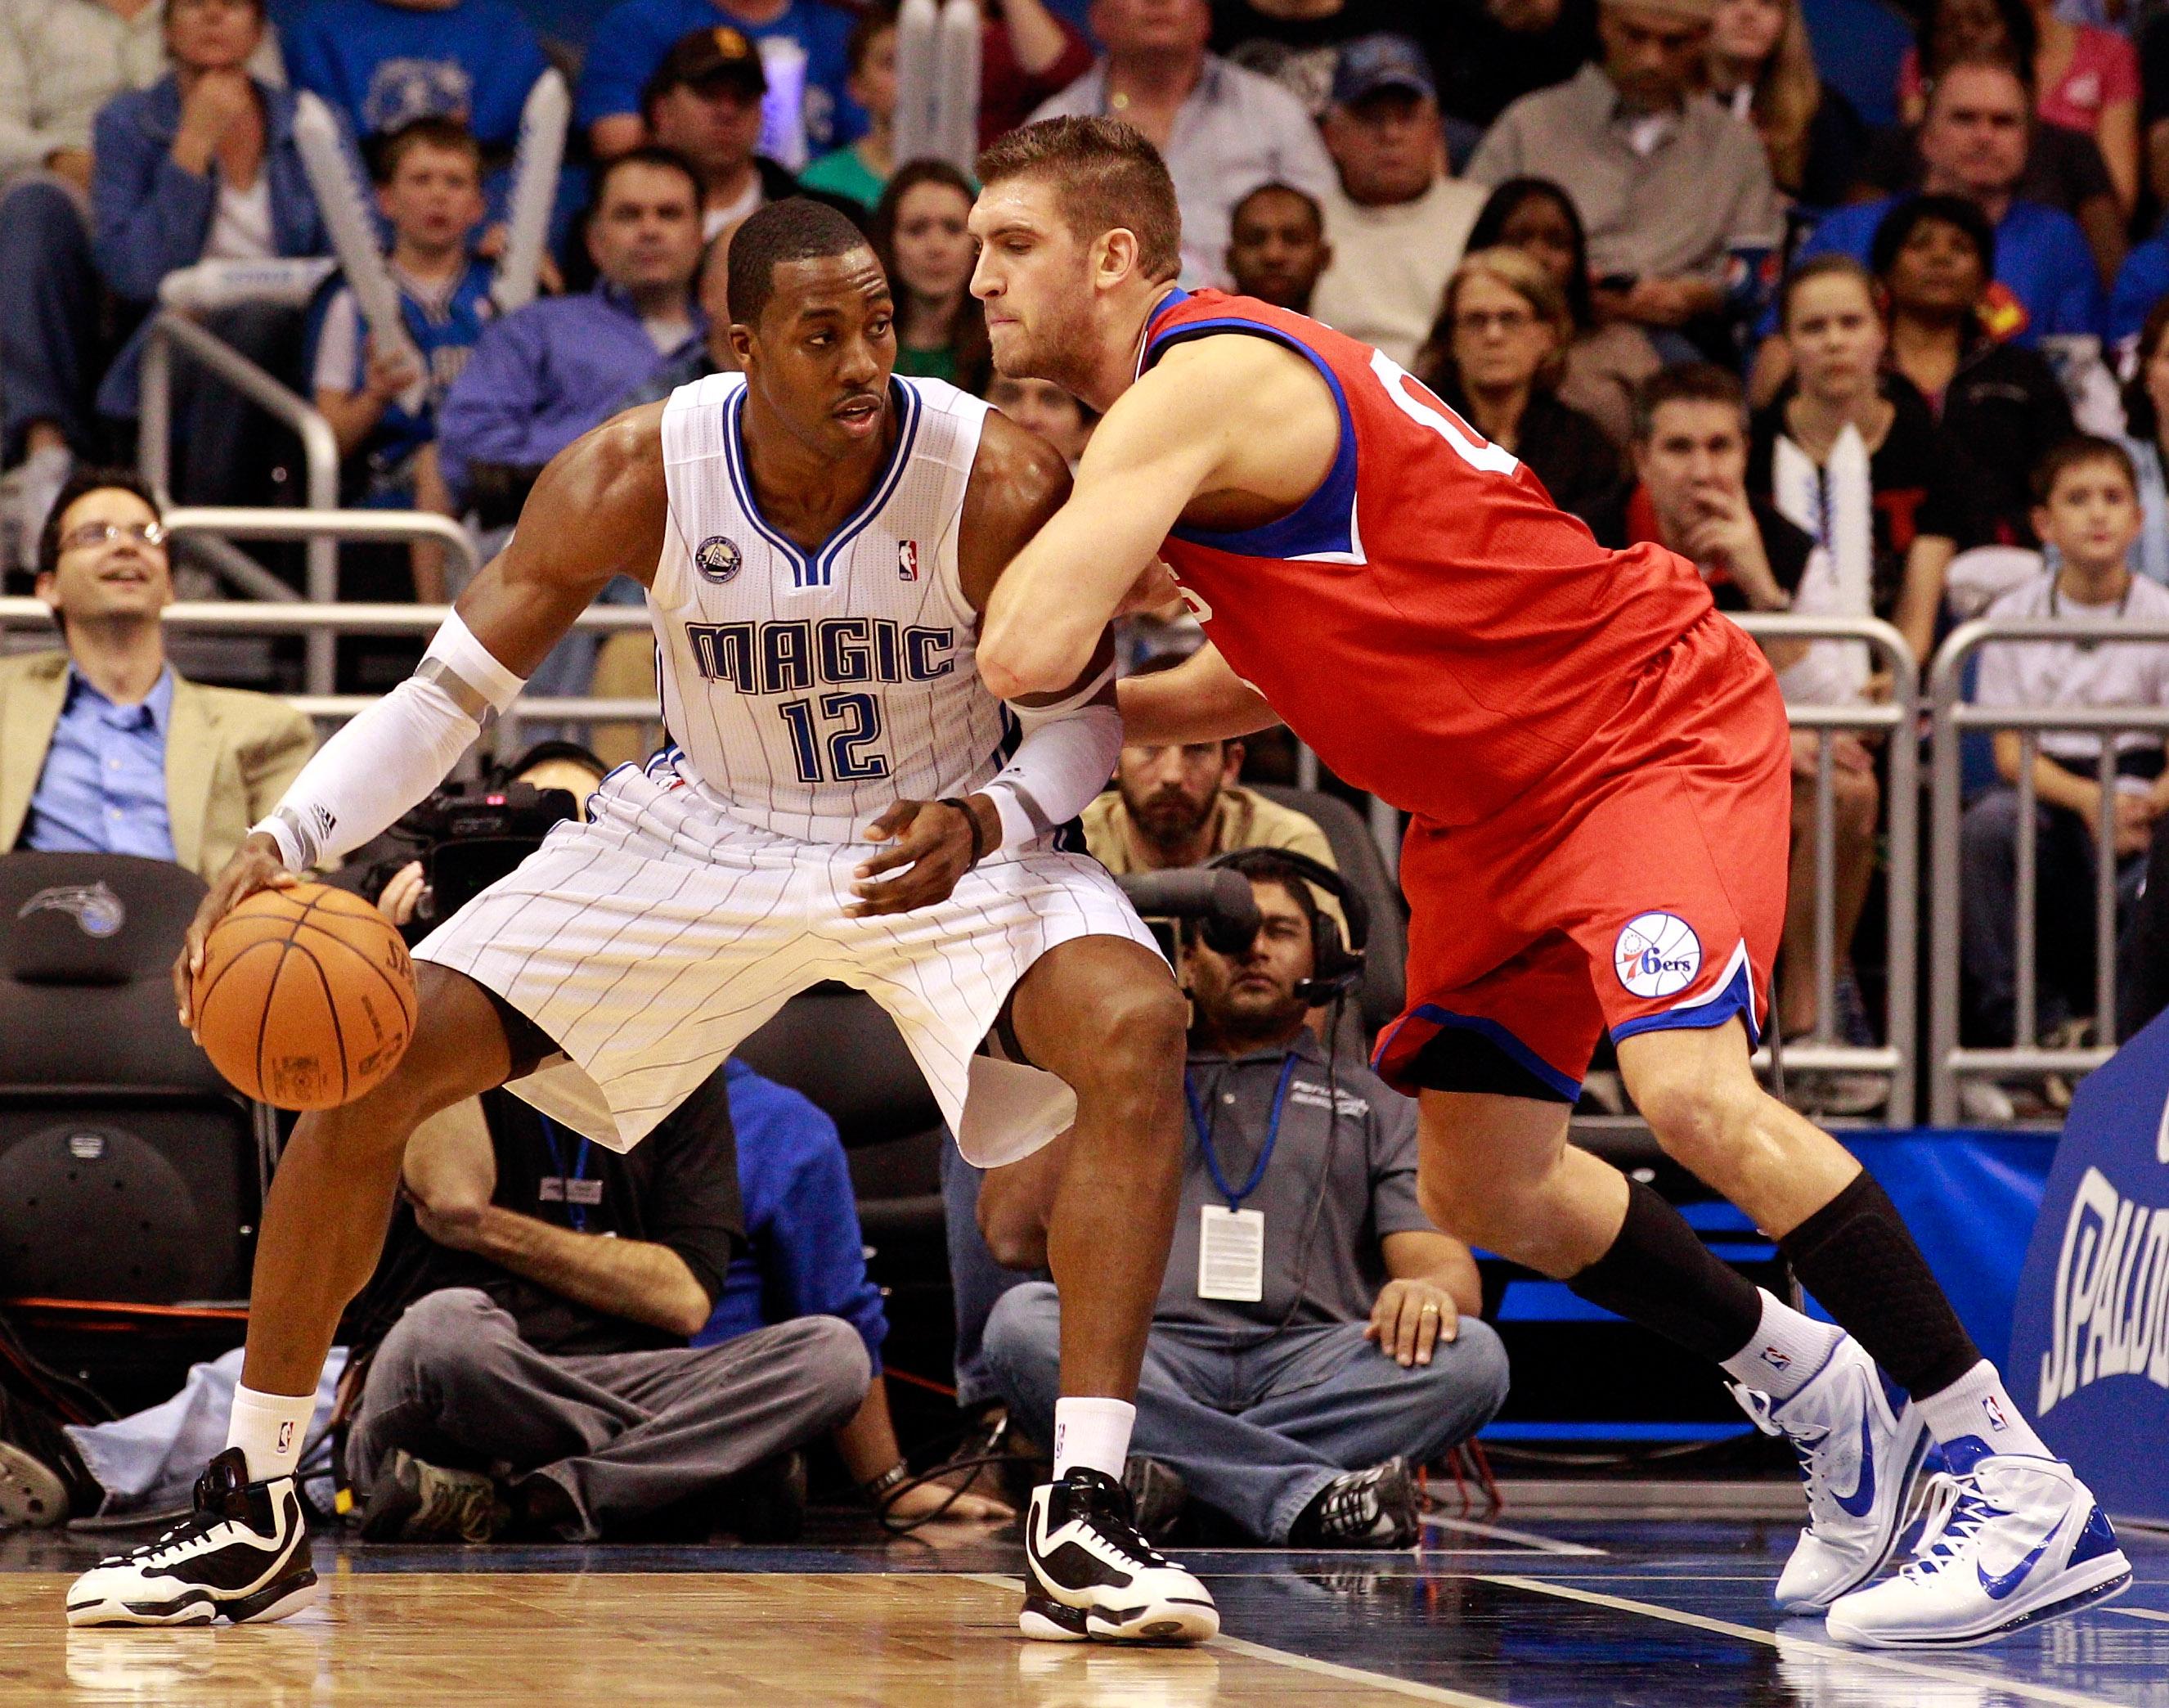 Dwight Howard Trade Rumors  10 Reasons Everyone in the NBA Is Overreacting 64b61a657